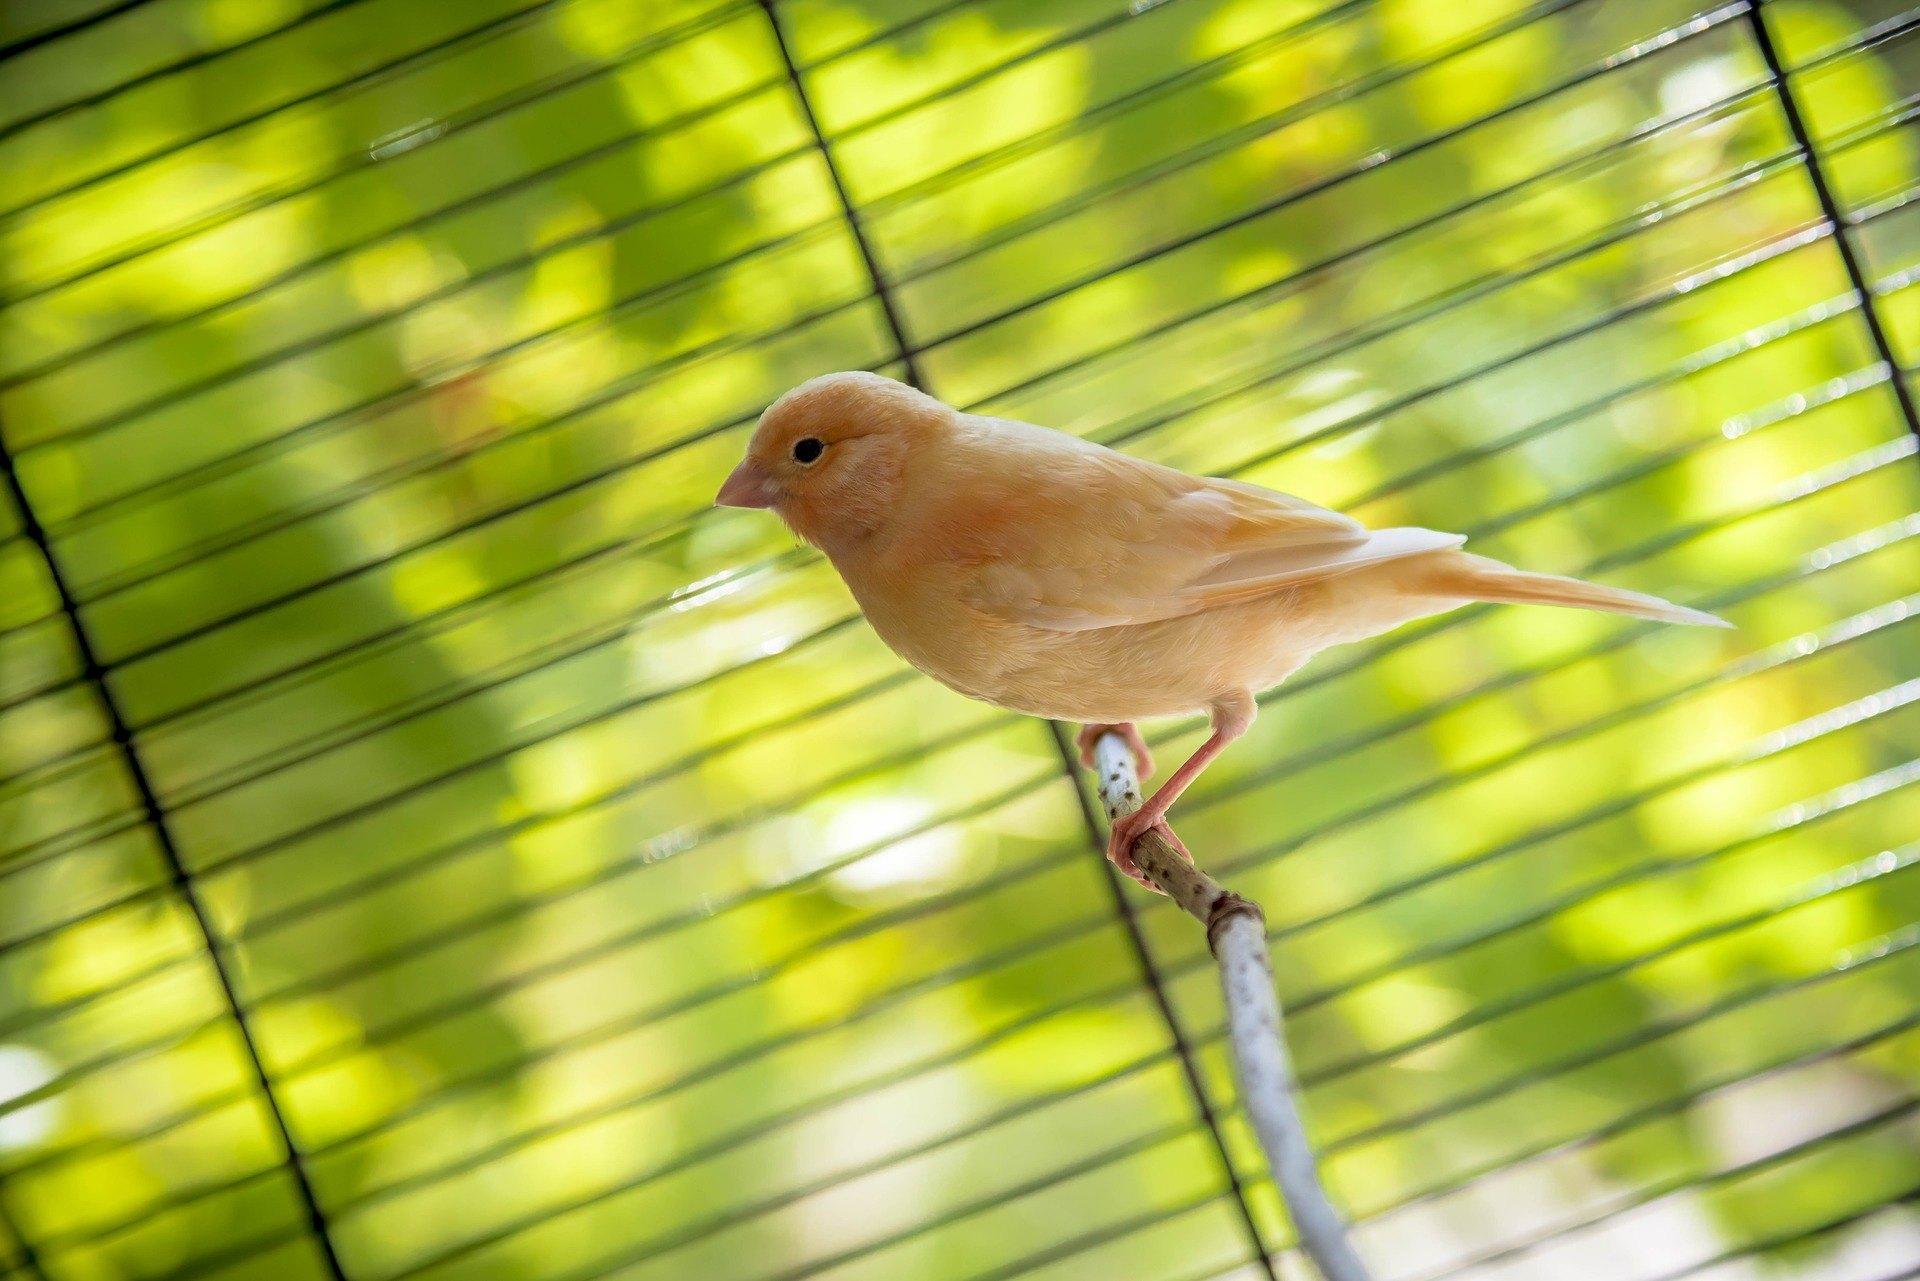 Toti canarii canta? Ce conditii trebuie sa-i asiguram canarului care traieste in casa? Cititi si aflati cele mai importante informatii.